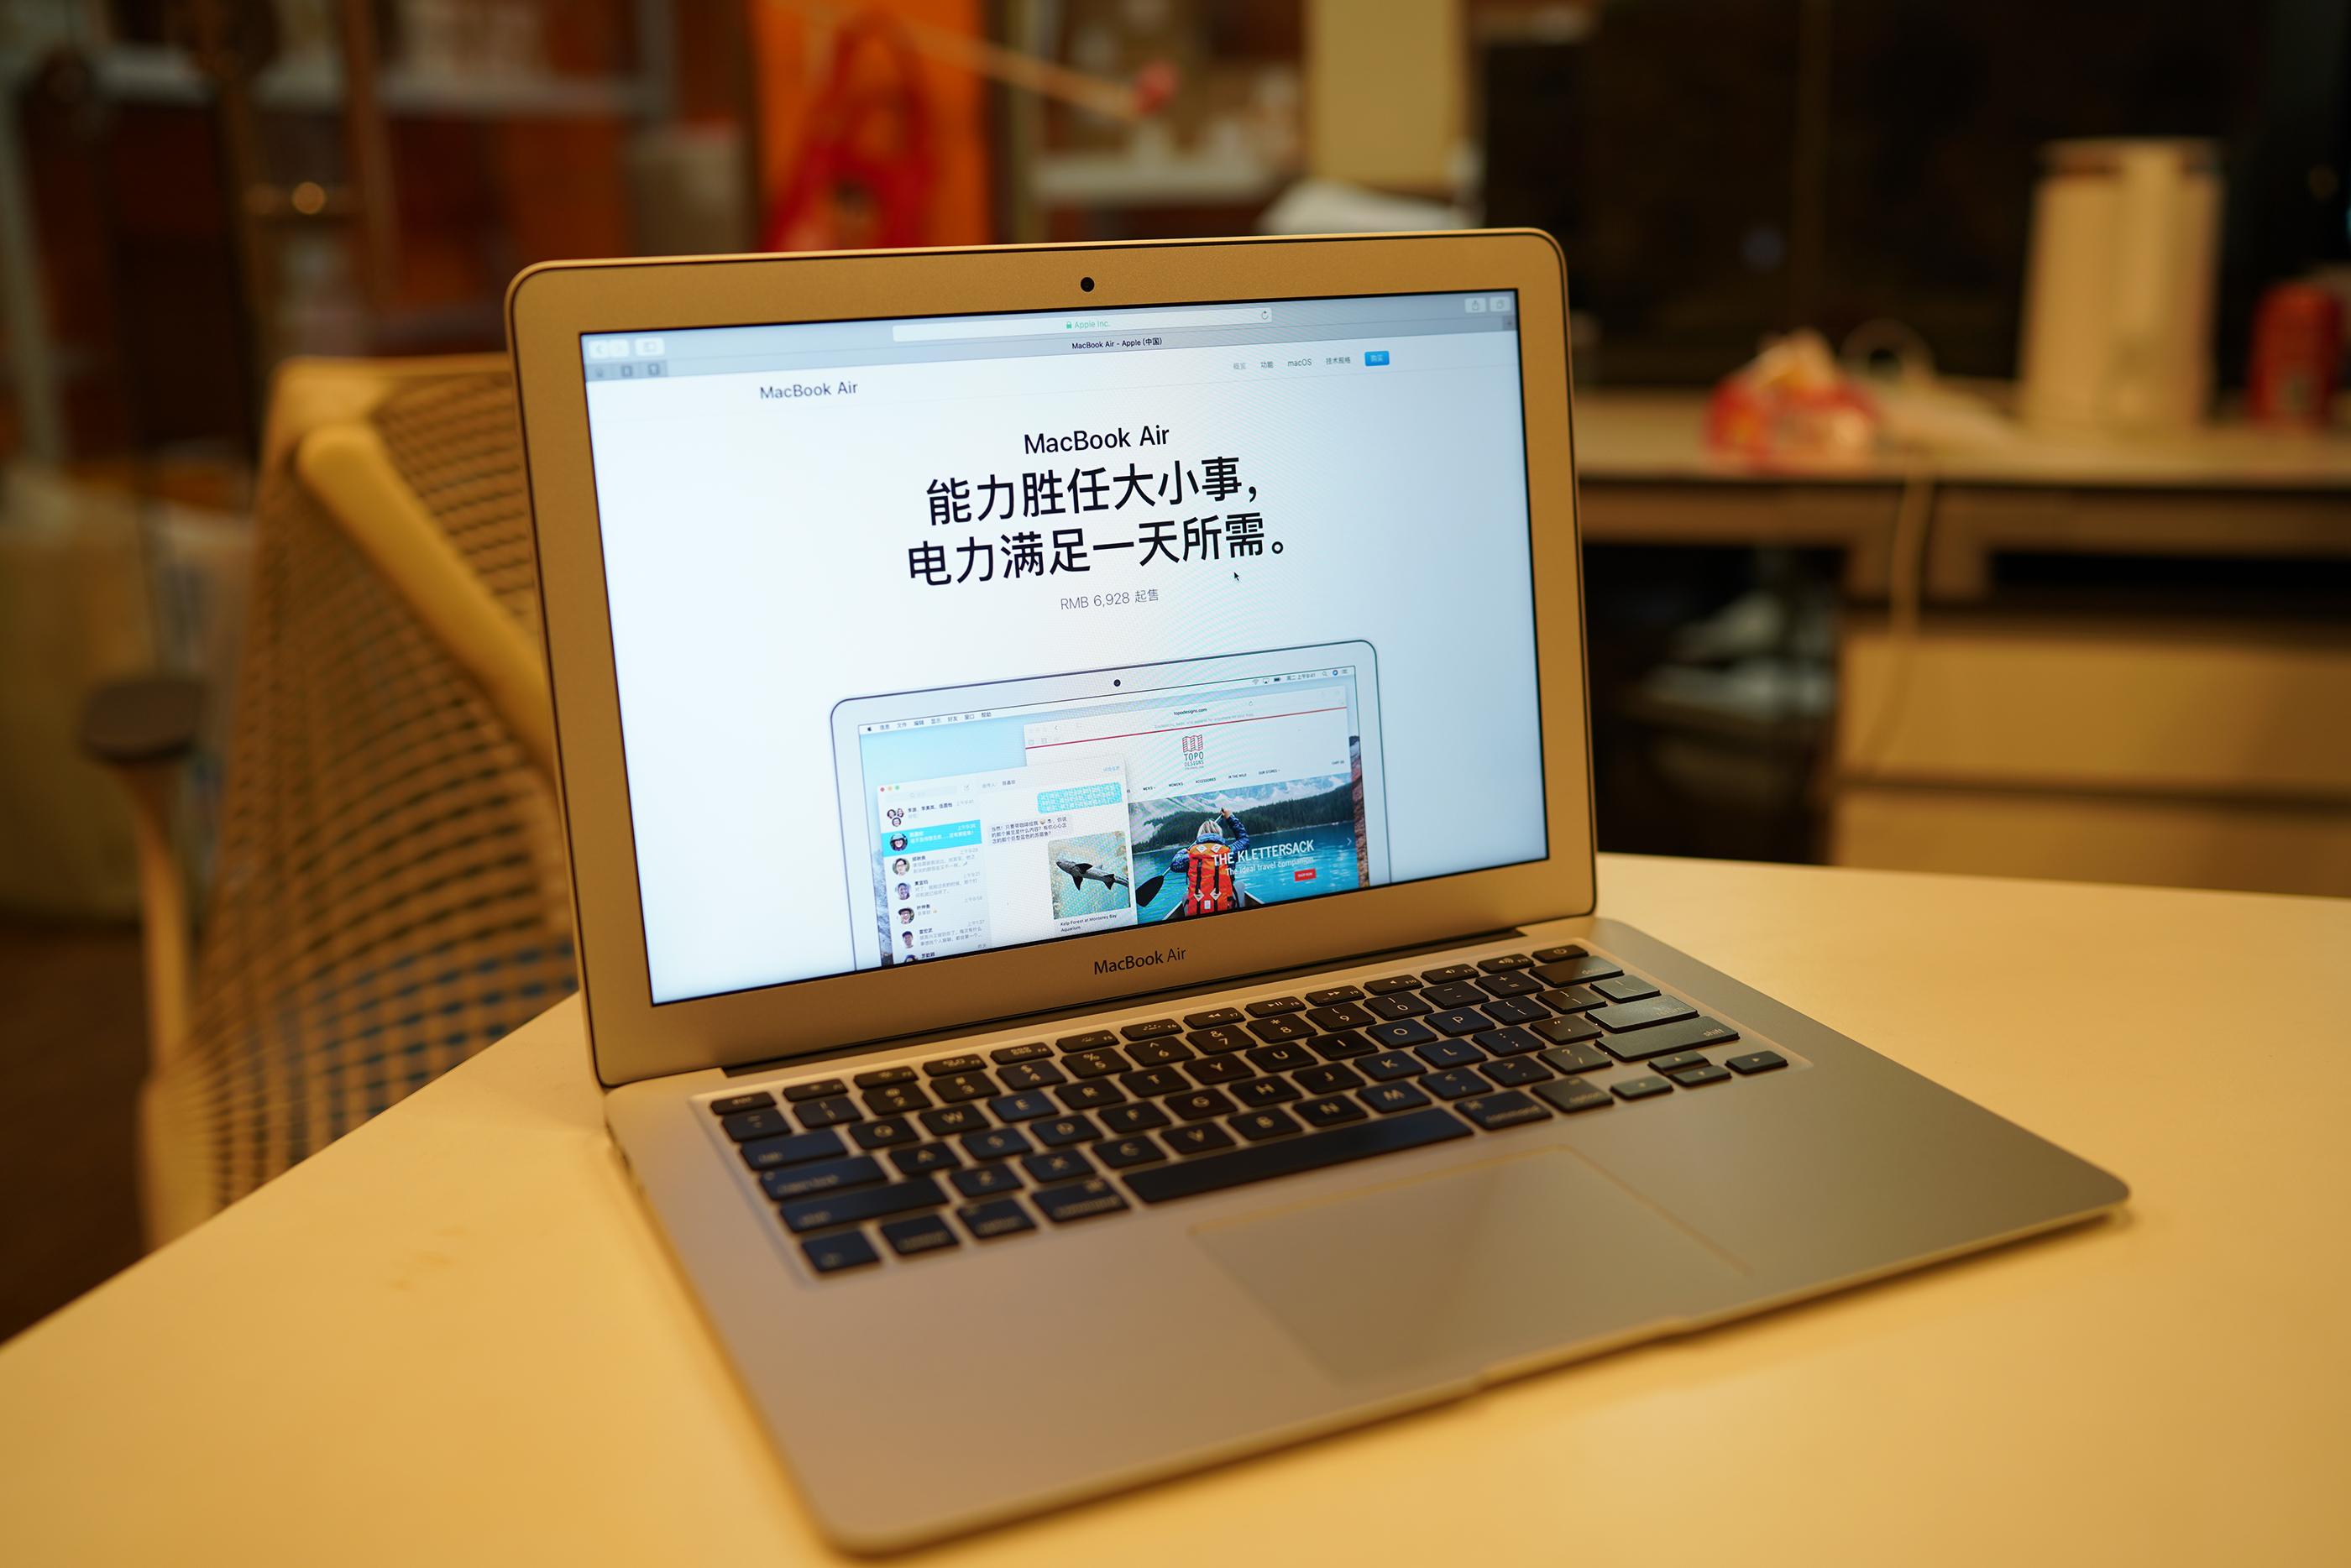 D42 寸笔记本电脑 13 国行 A MQD32CH Air MacBook 苹果 Apple 款 2017